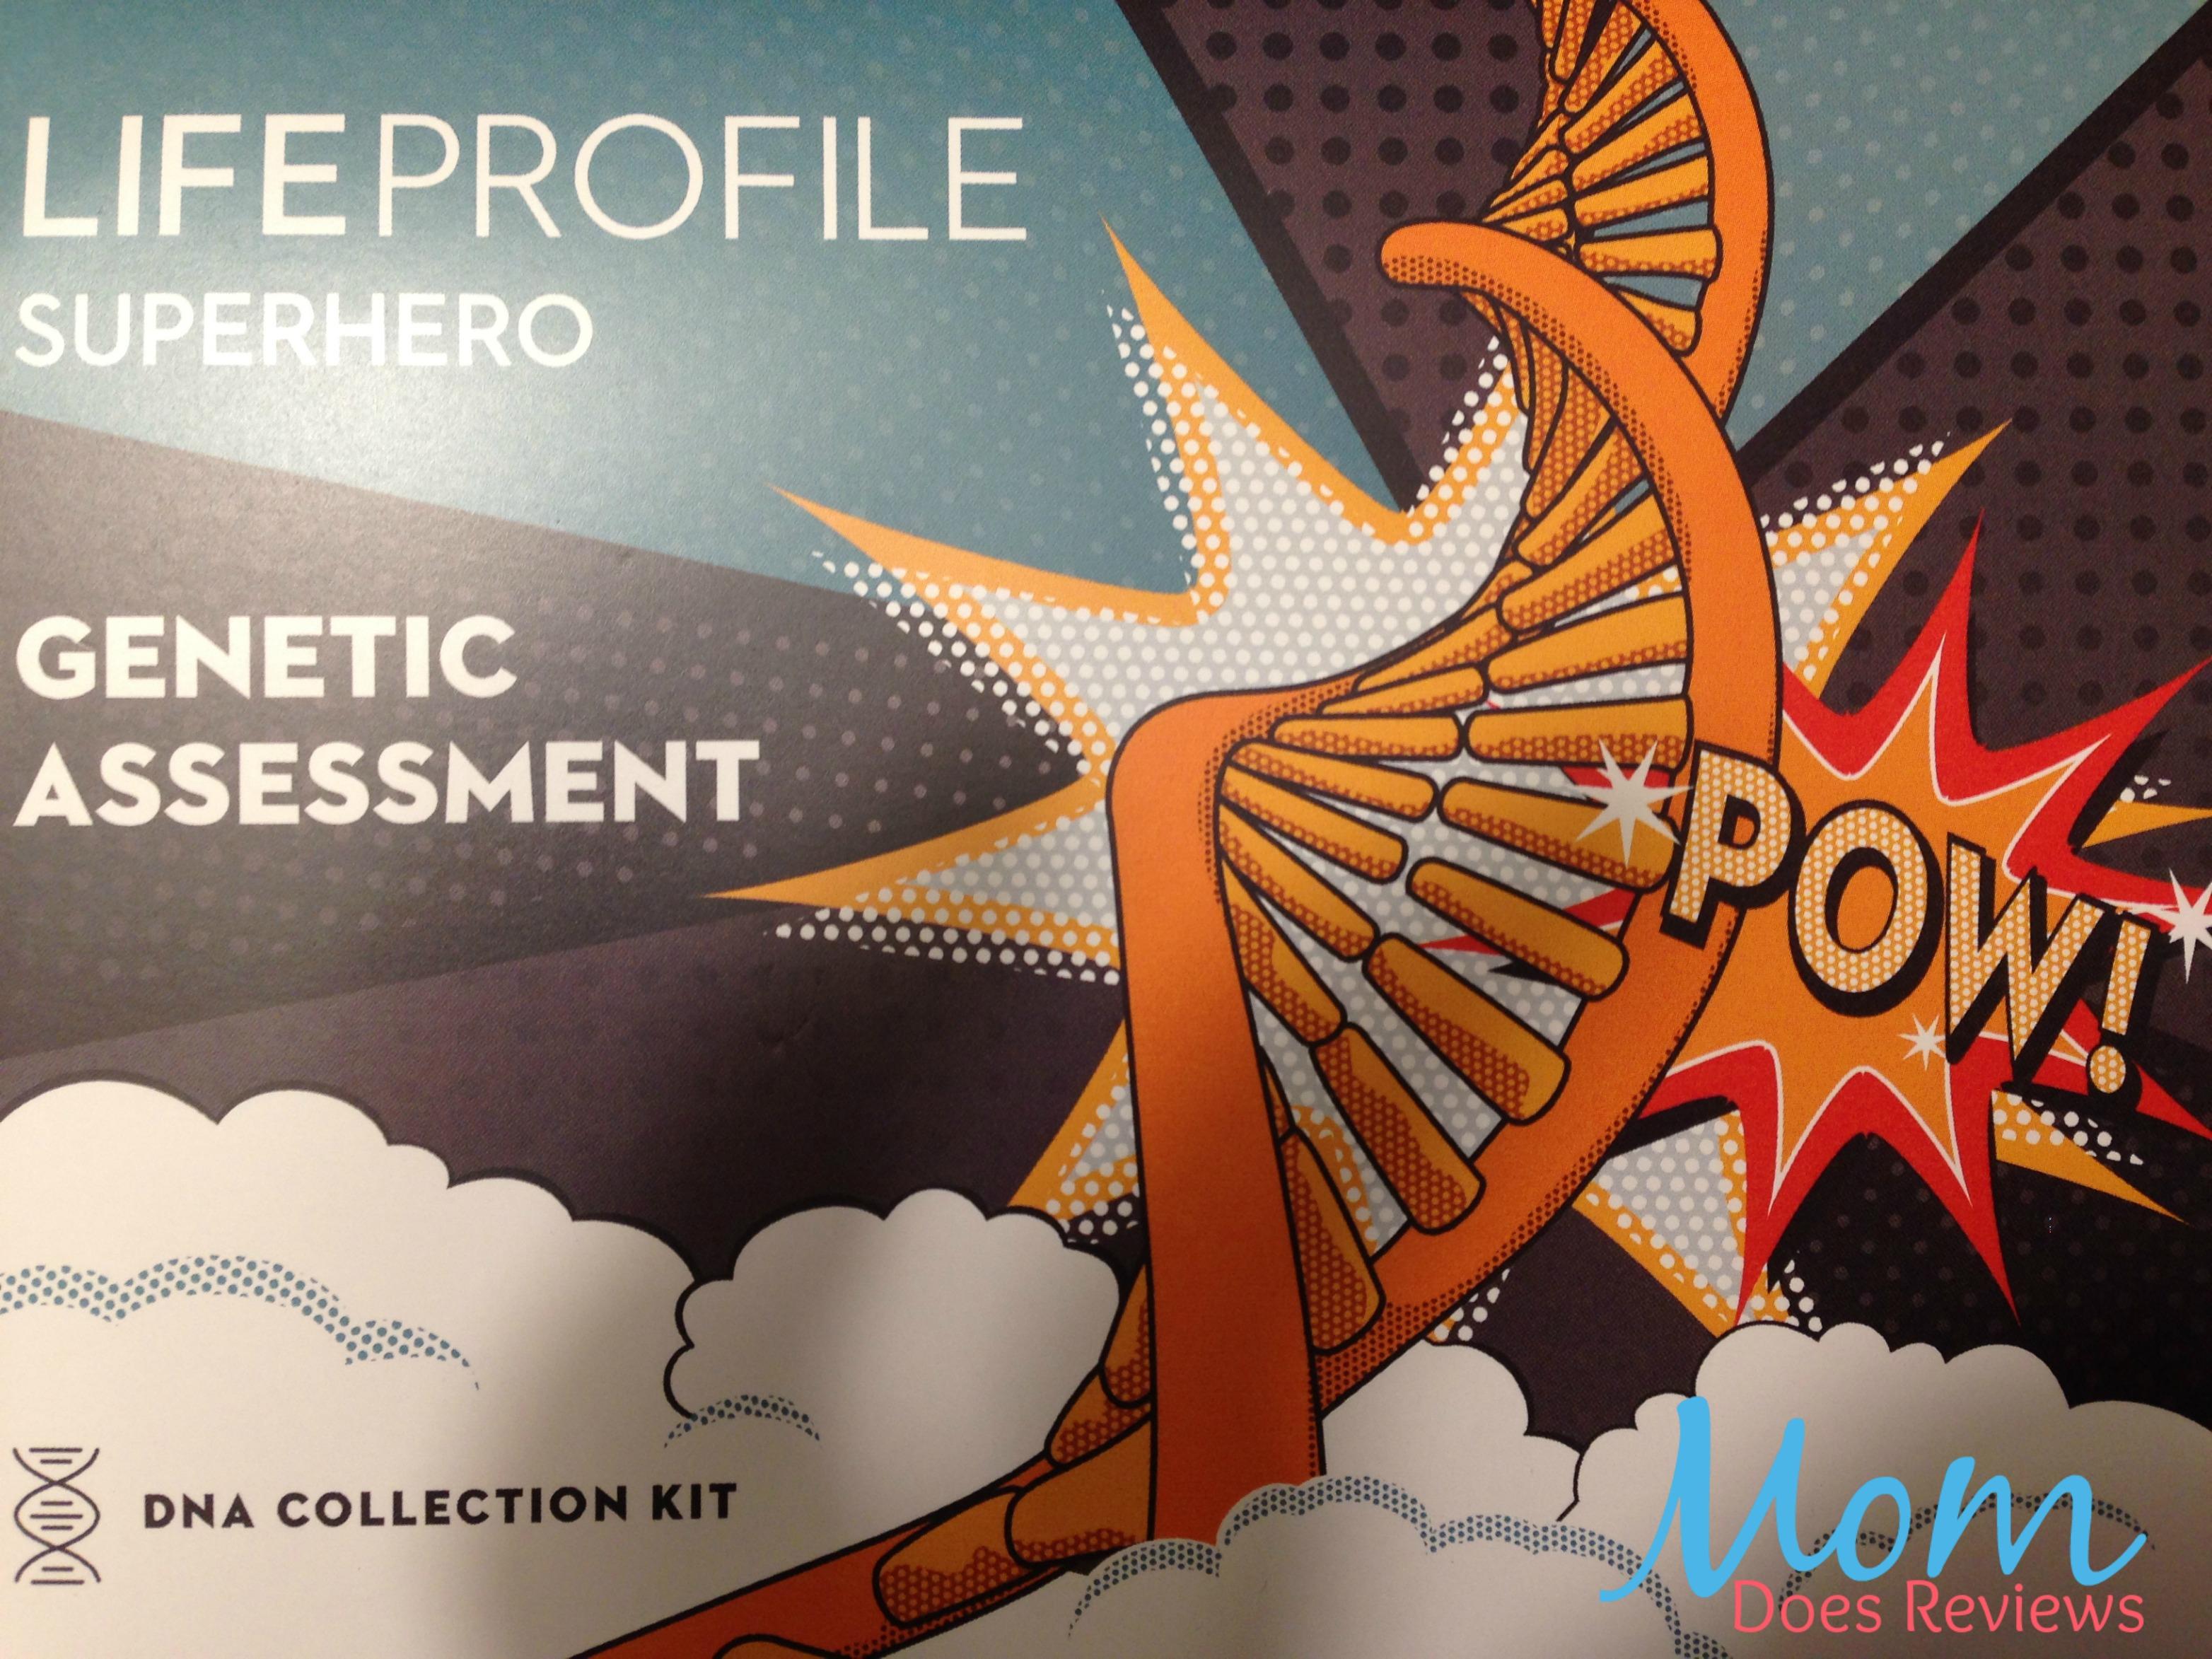 orig3n-superhero-lifeprofile